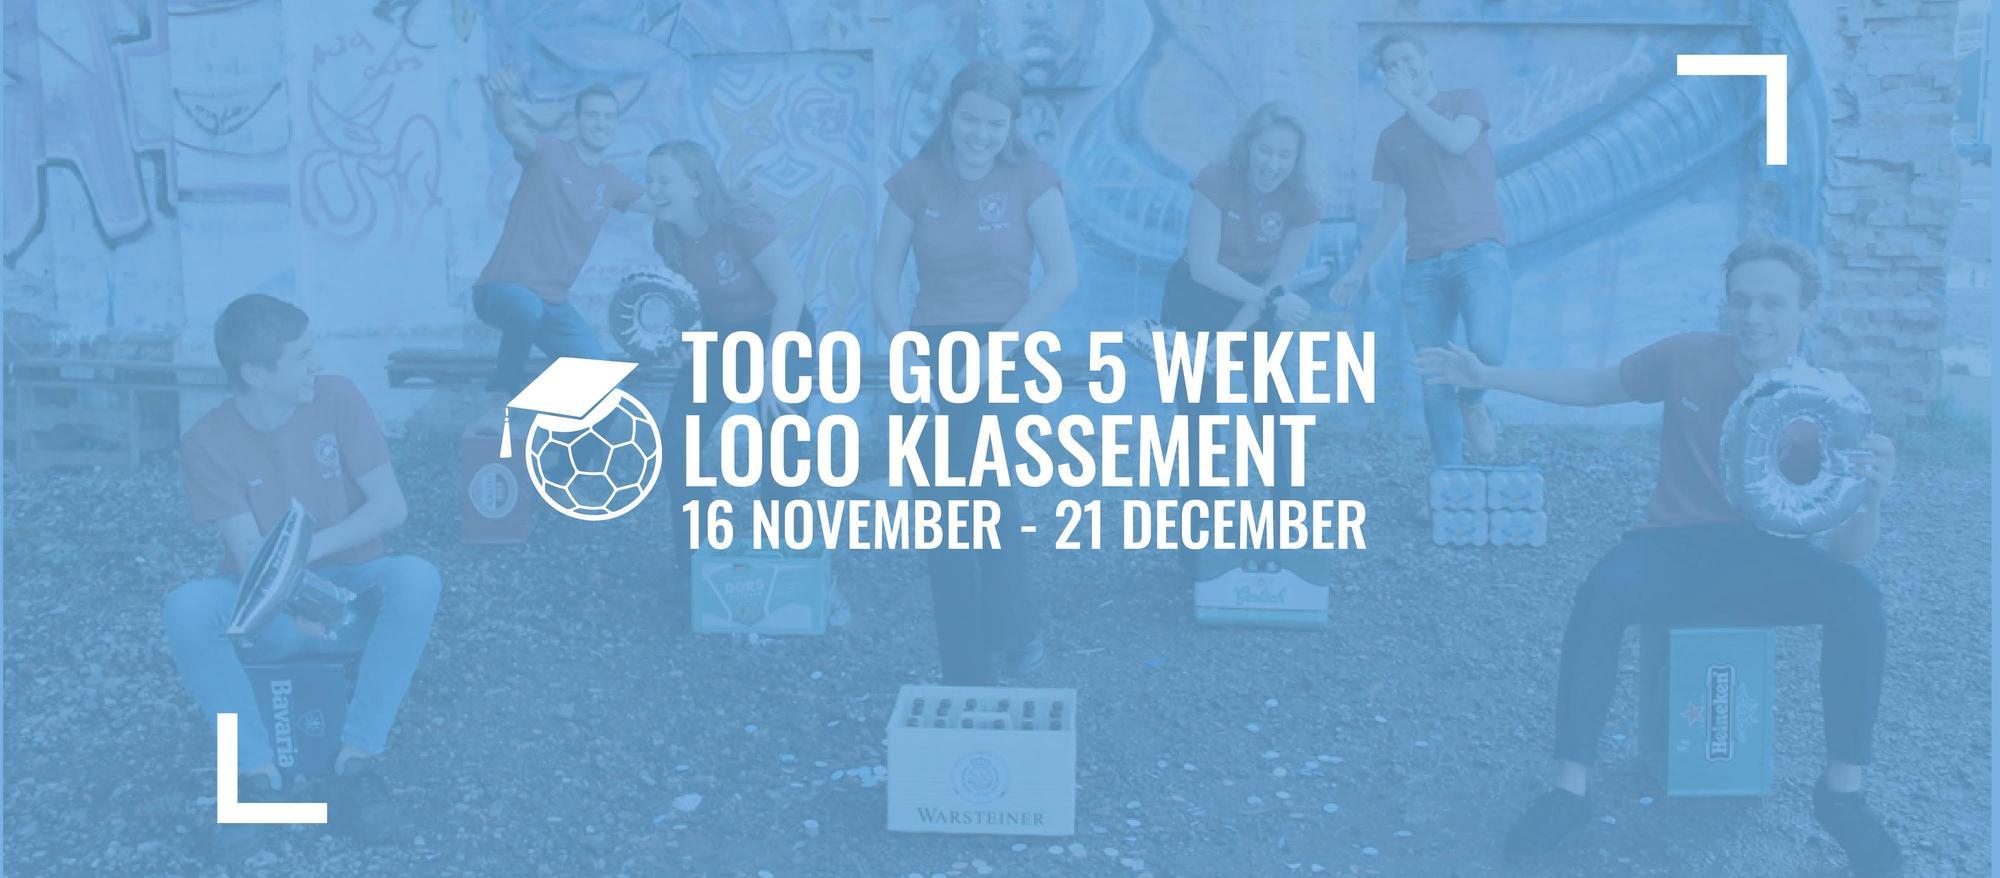 ToCo Goes Loco Klassement